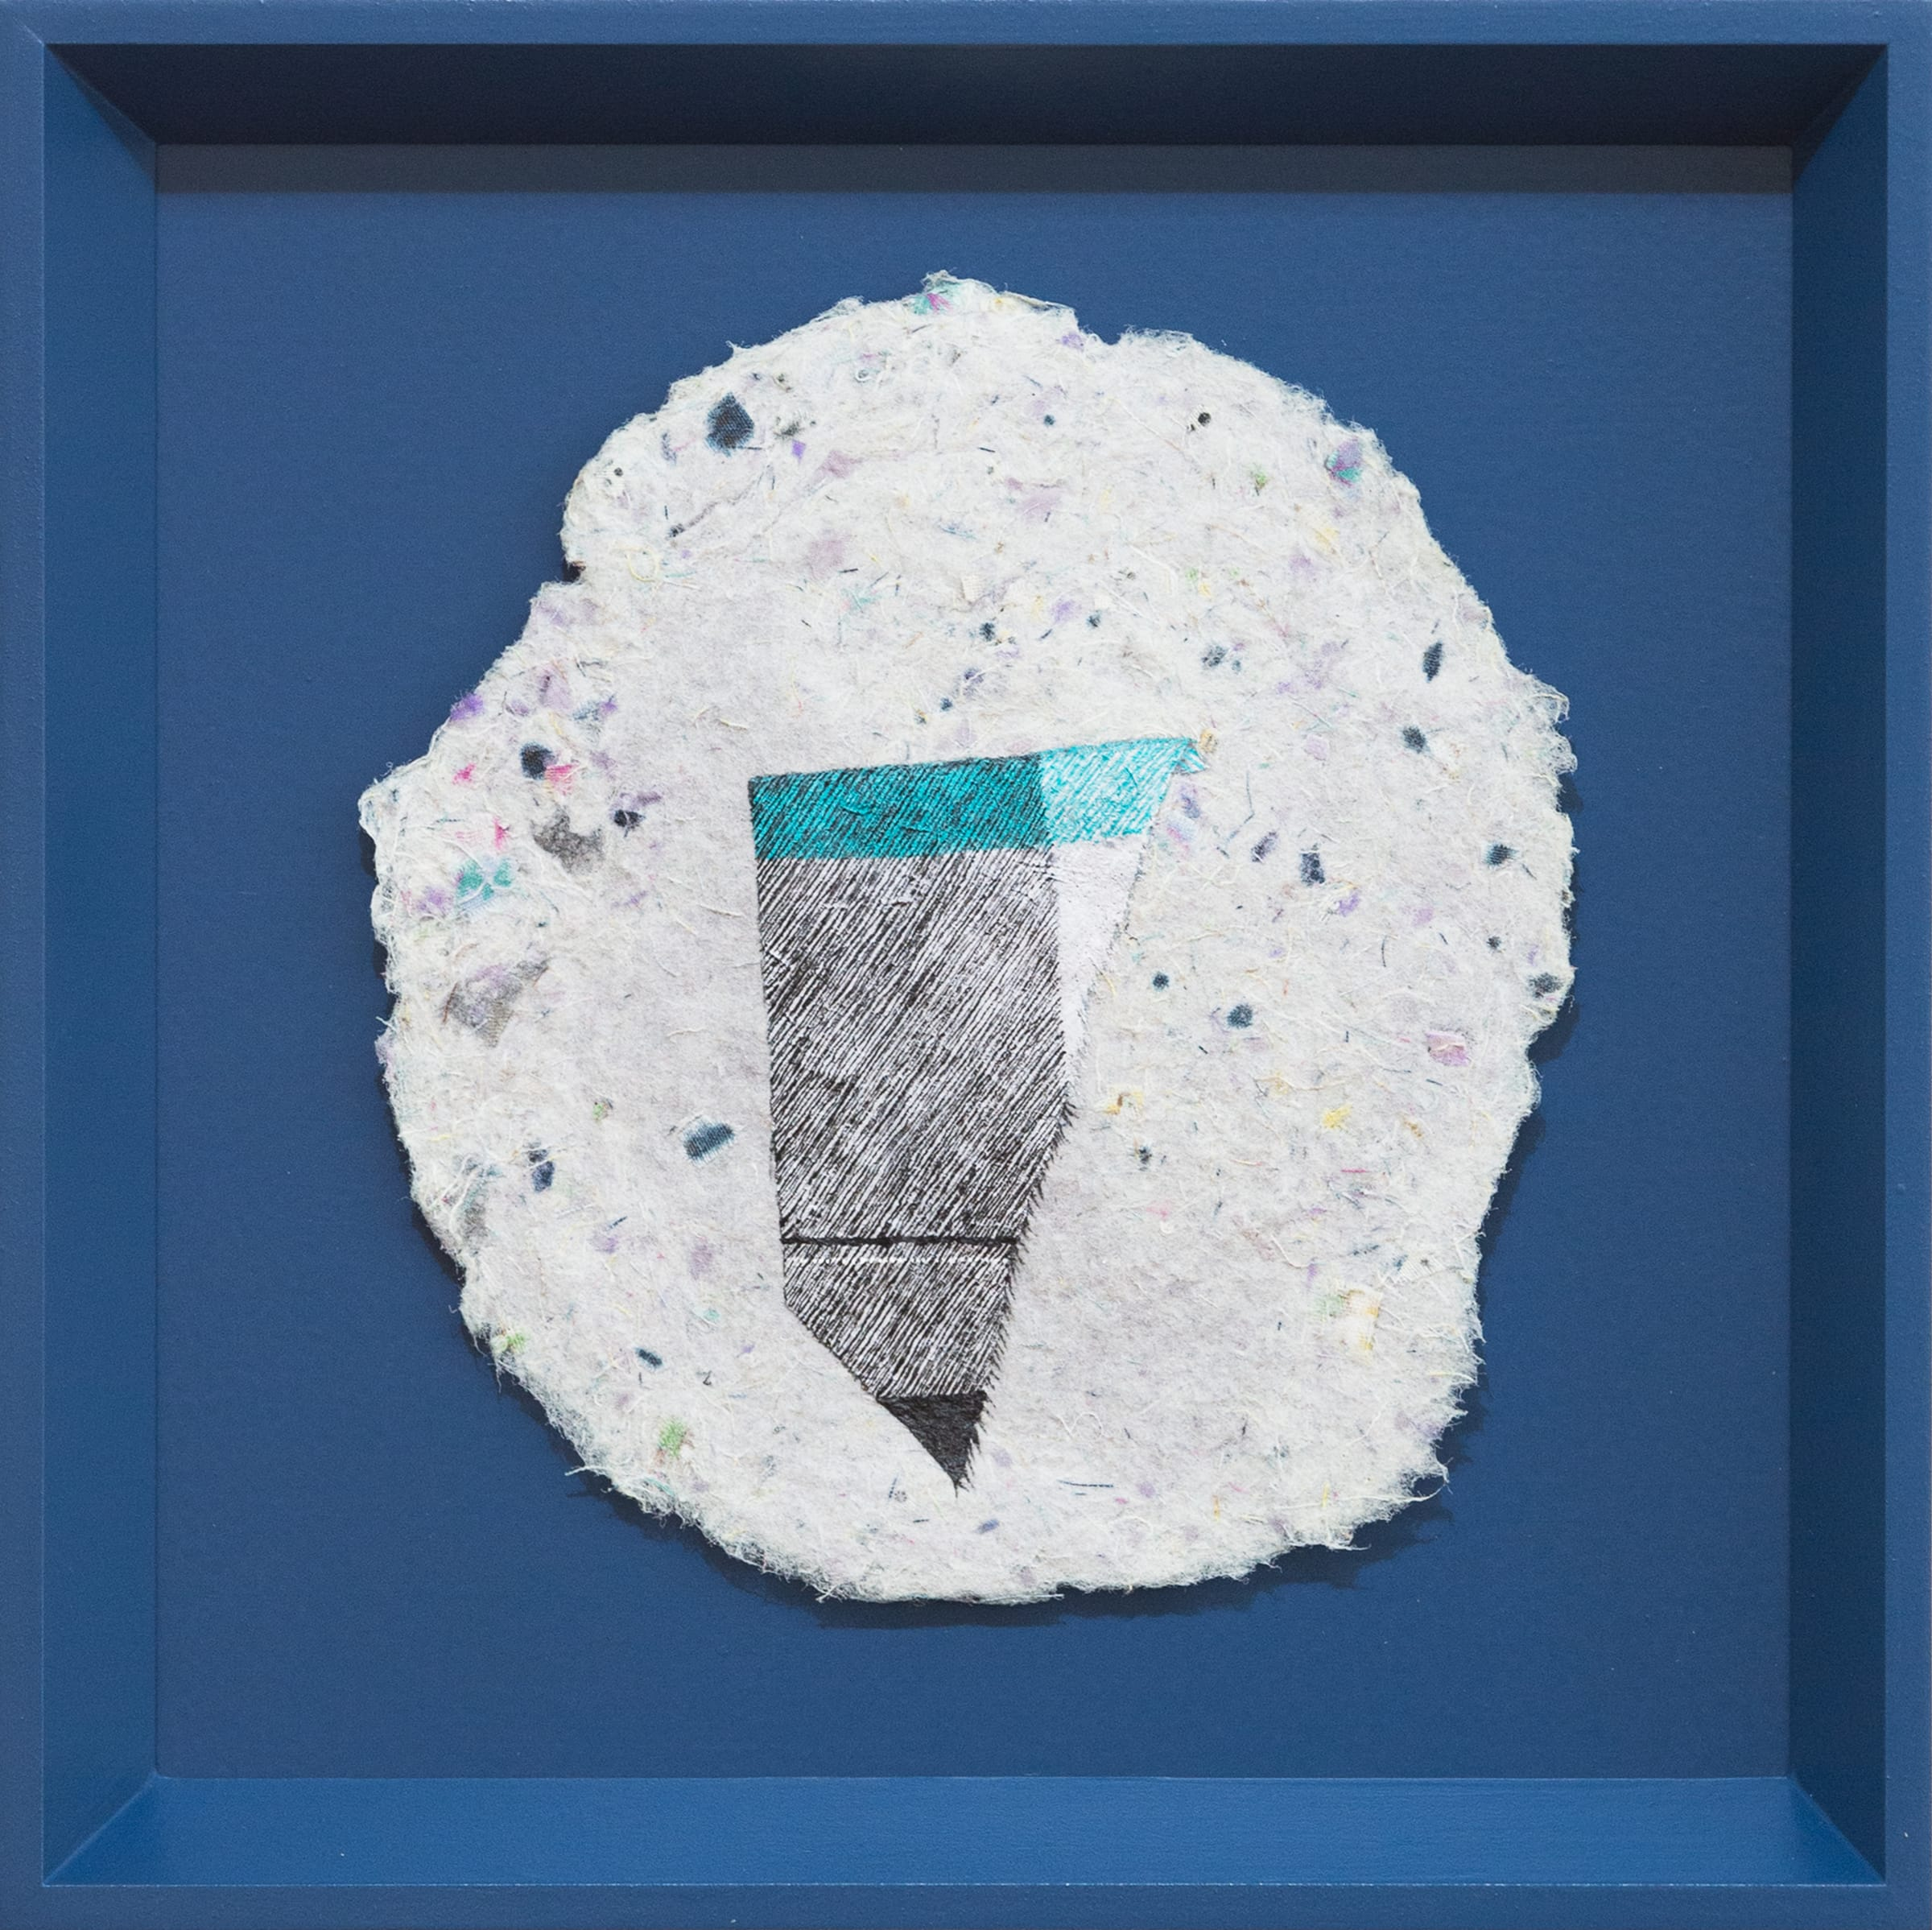 "<span class=""link fancybox-details-link""><a href=""/exhibitions/113/works/artworks8657/"">View Detail Page</a></span><div class=""medium"">Watercolour and gouache on handmade cotton, linen rag paper</div> <div class=""dimensions"">225mm x 225mm x 35mm</div>"